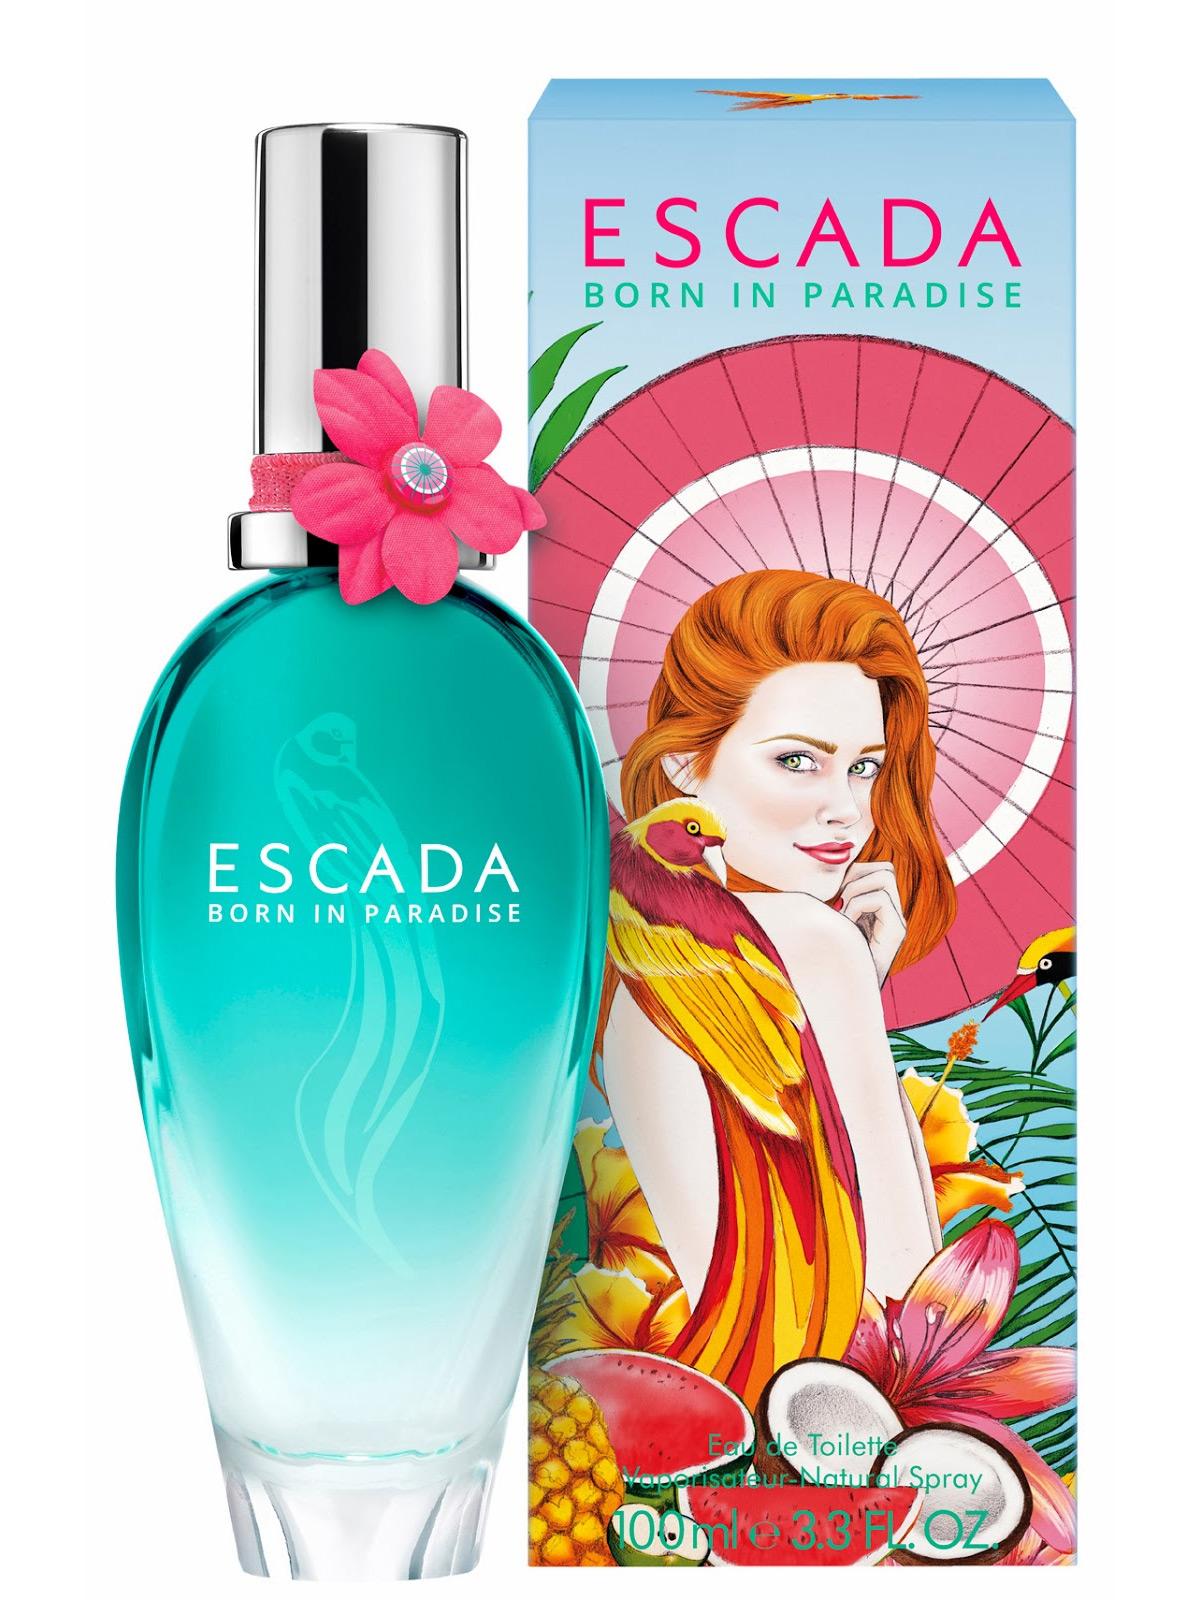 Escada Paradise Perfume